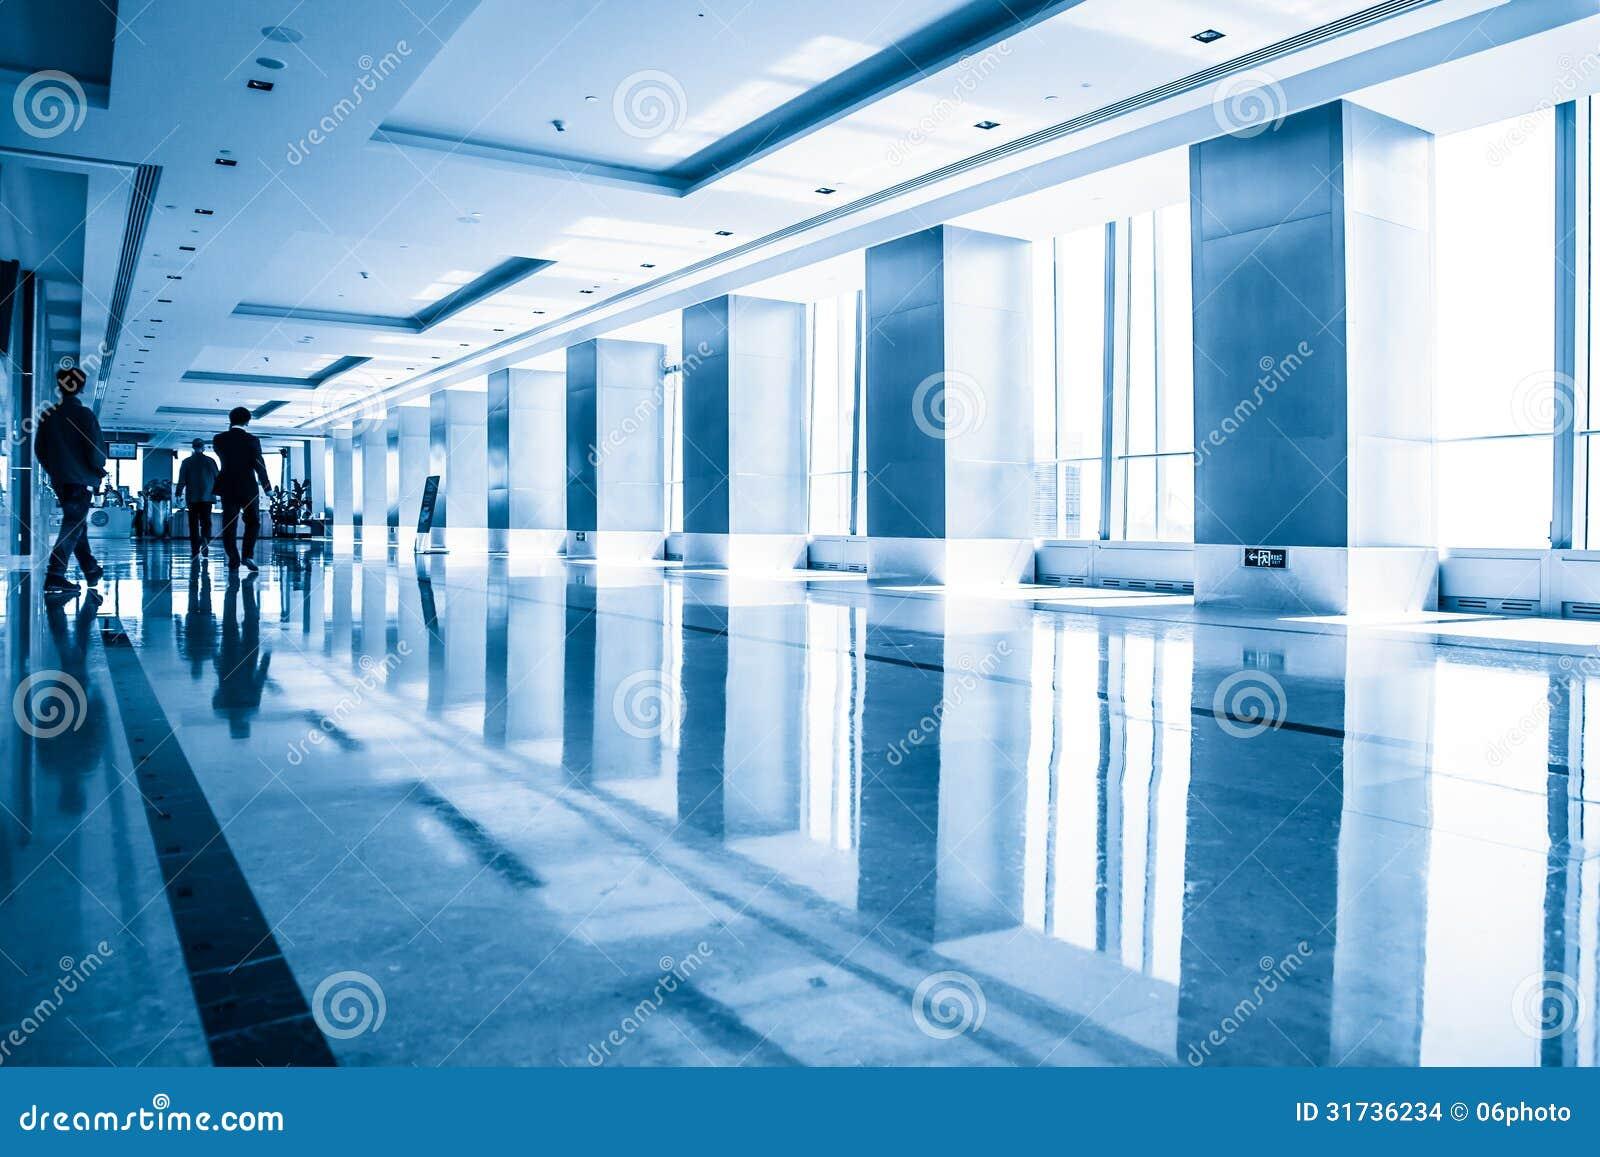 Building interior silhouette stock photo cartoondealer for Modern office building interior